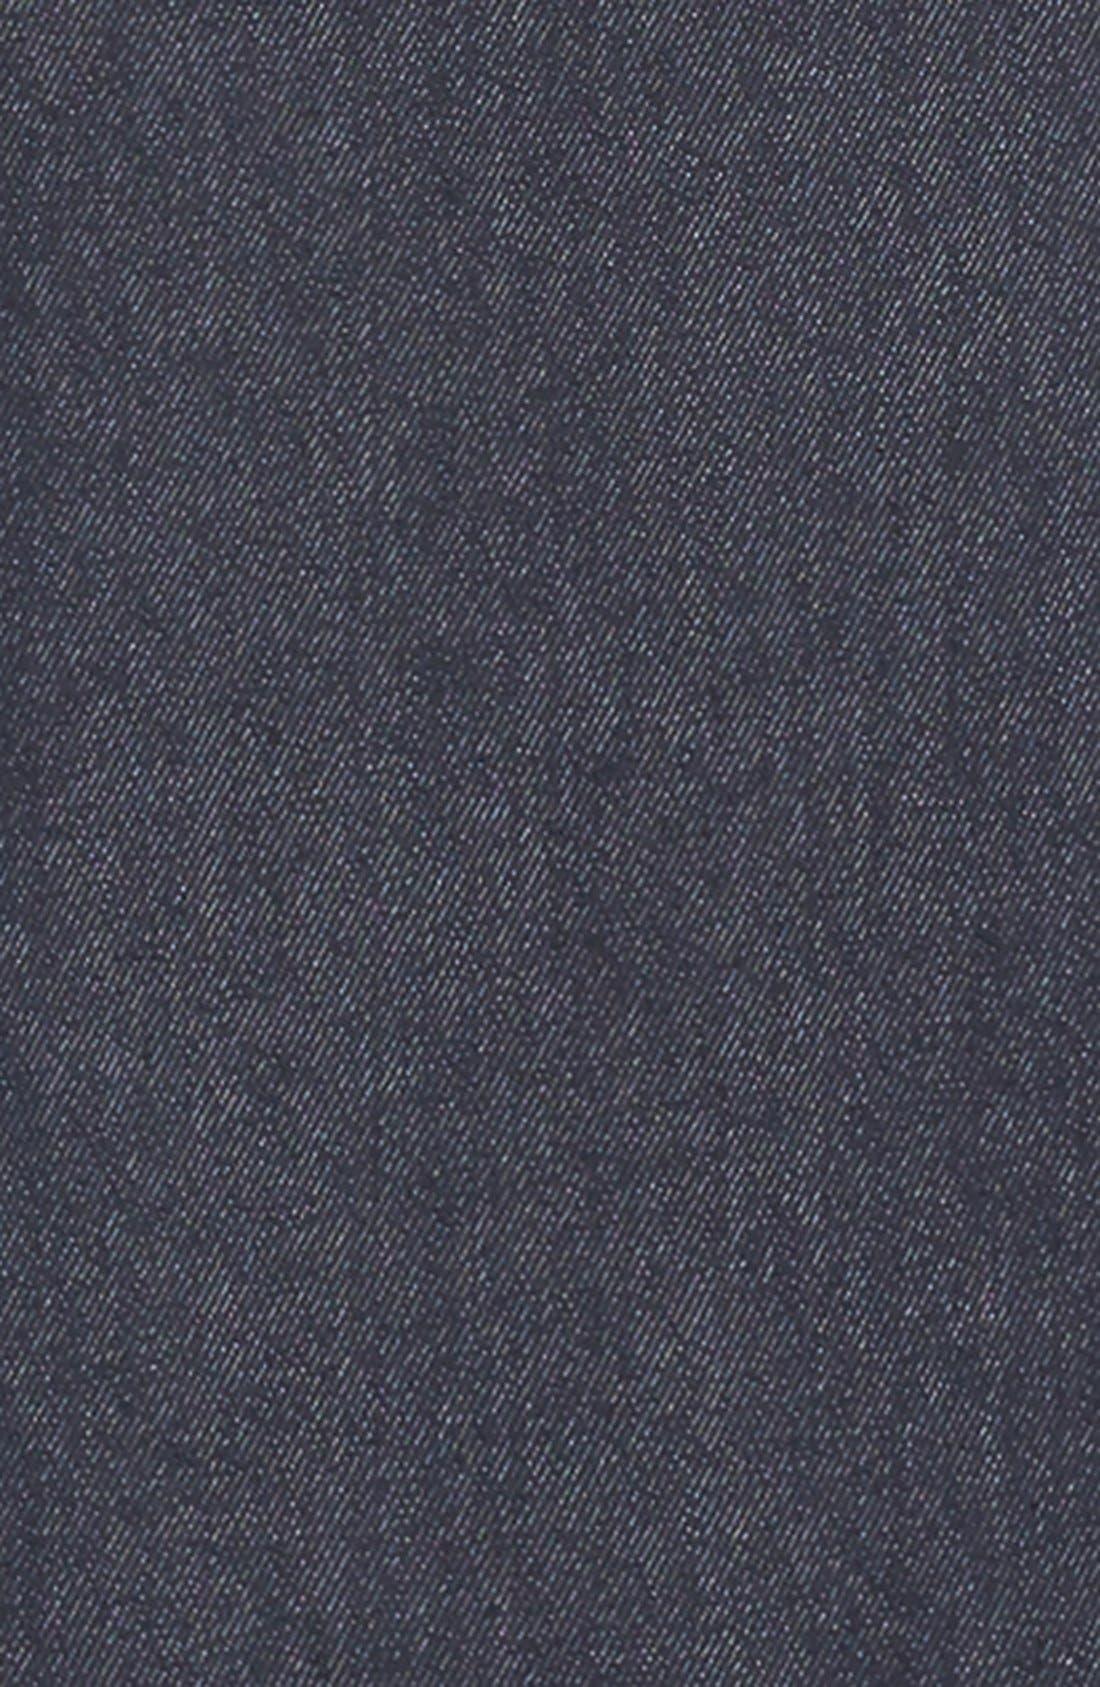 Alternate Image 5  - MSGM Pleat Bottom Sleeveless Shift Dress